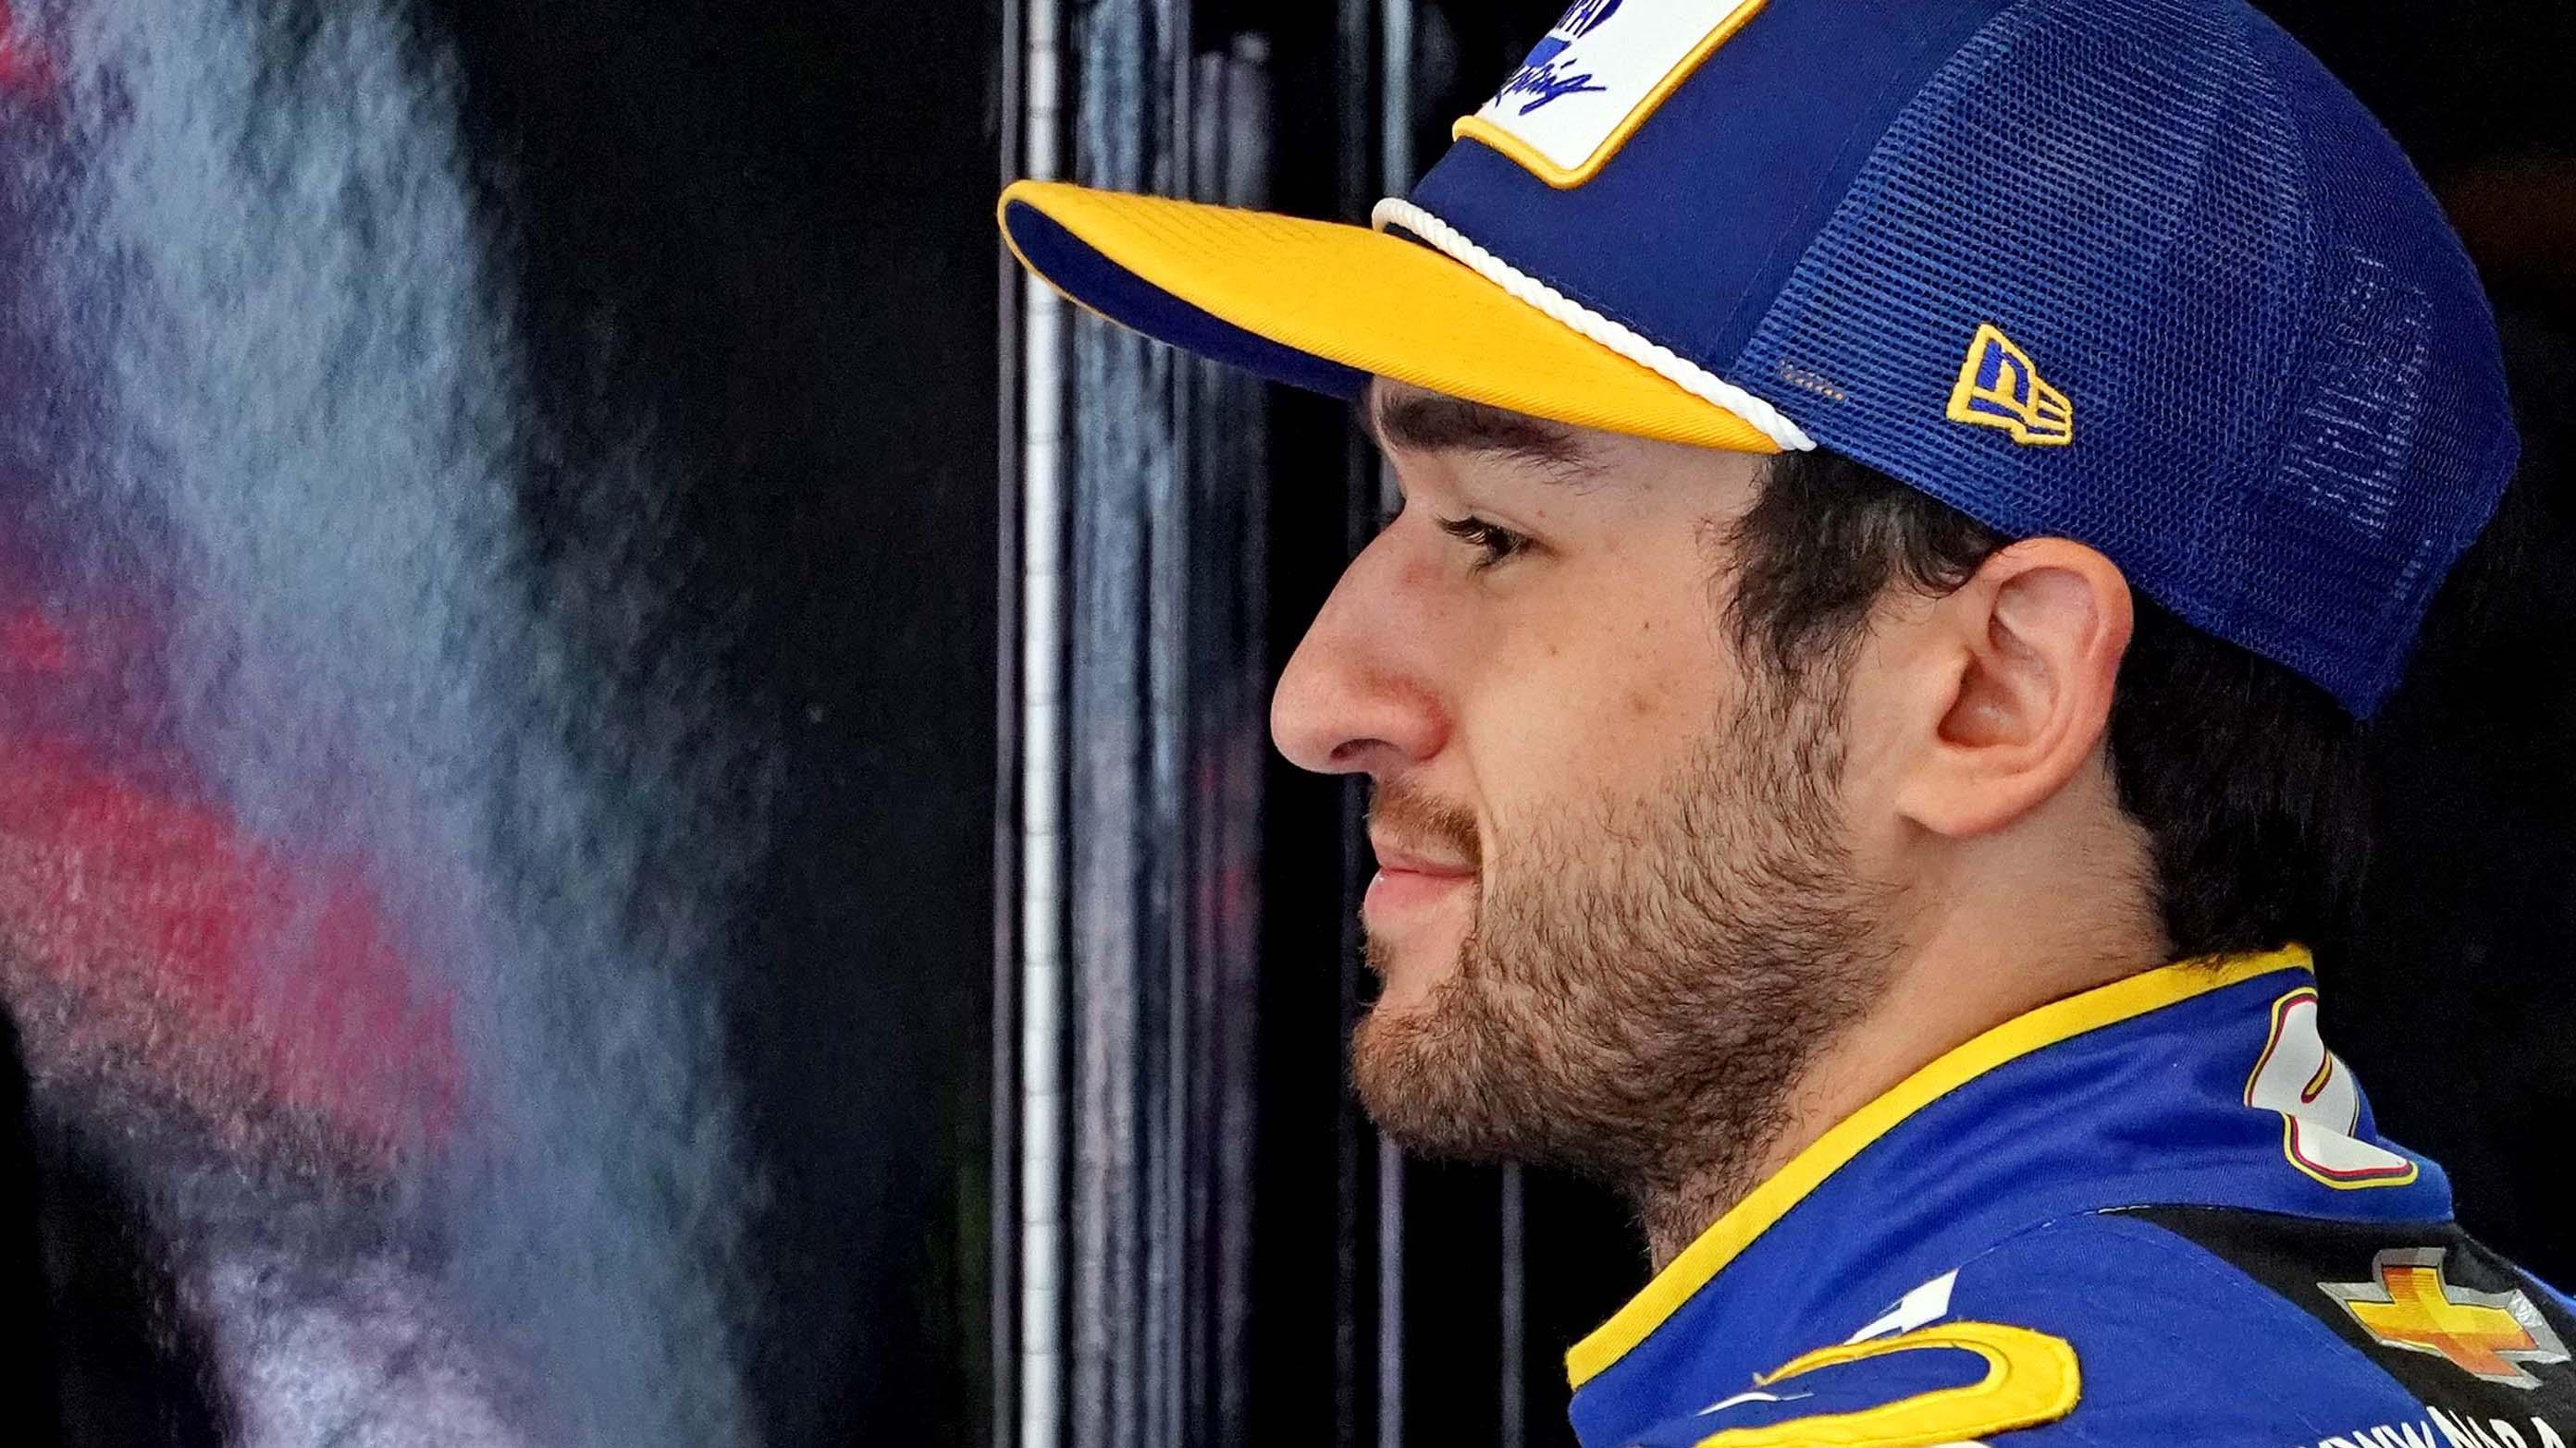 Chase Elliott, Kyle Larson Sign On For Kyle Busch Truck Bounty Challenge